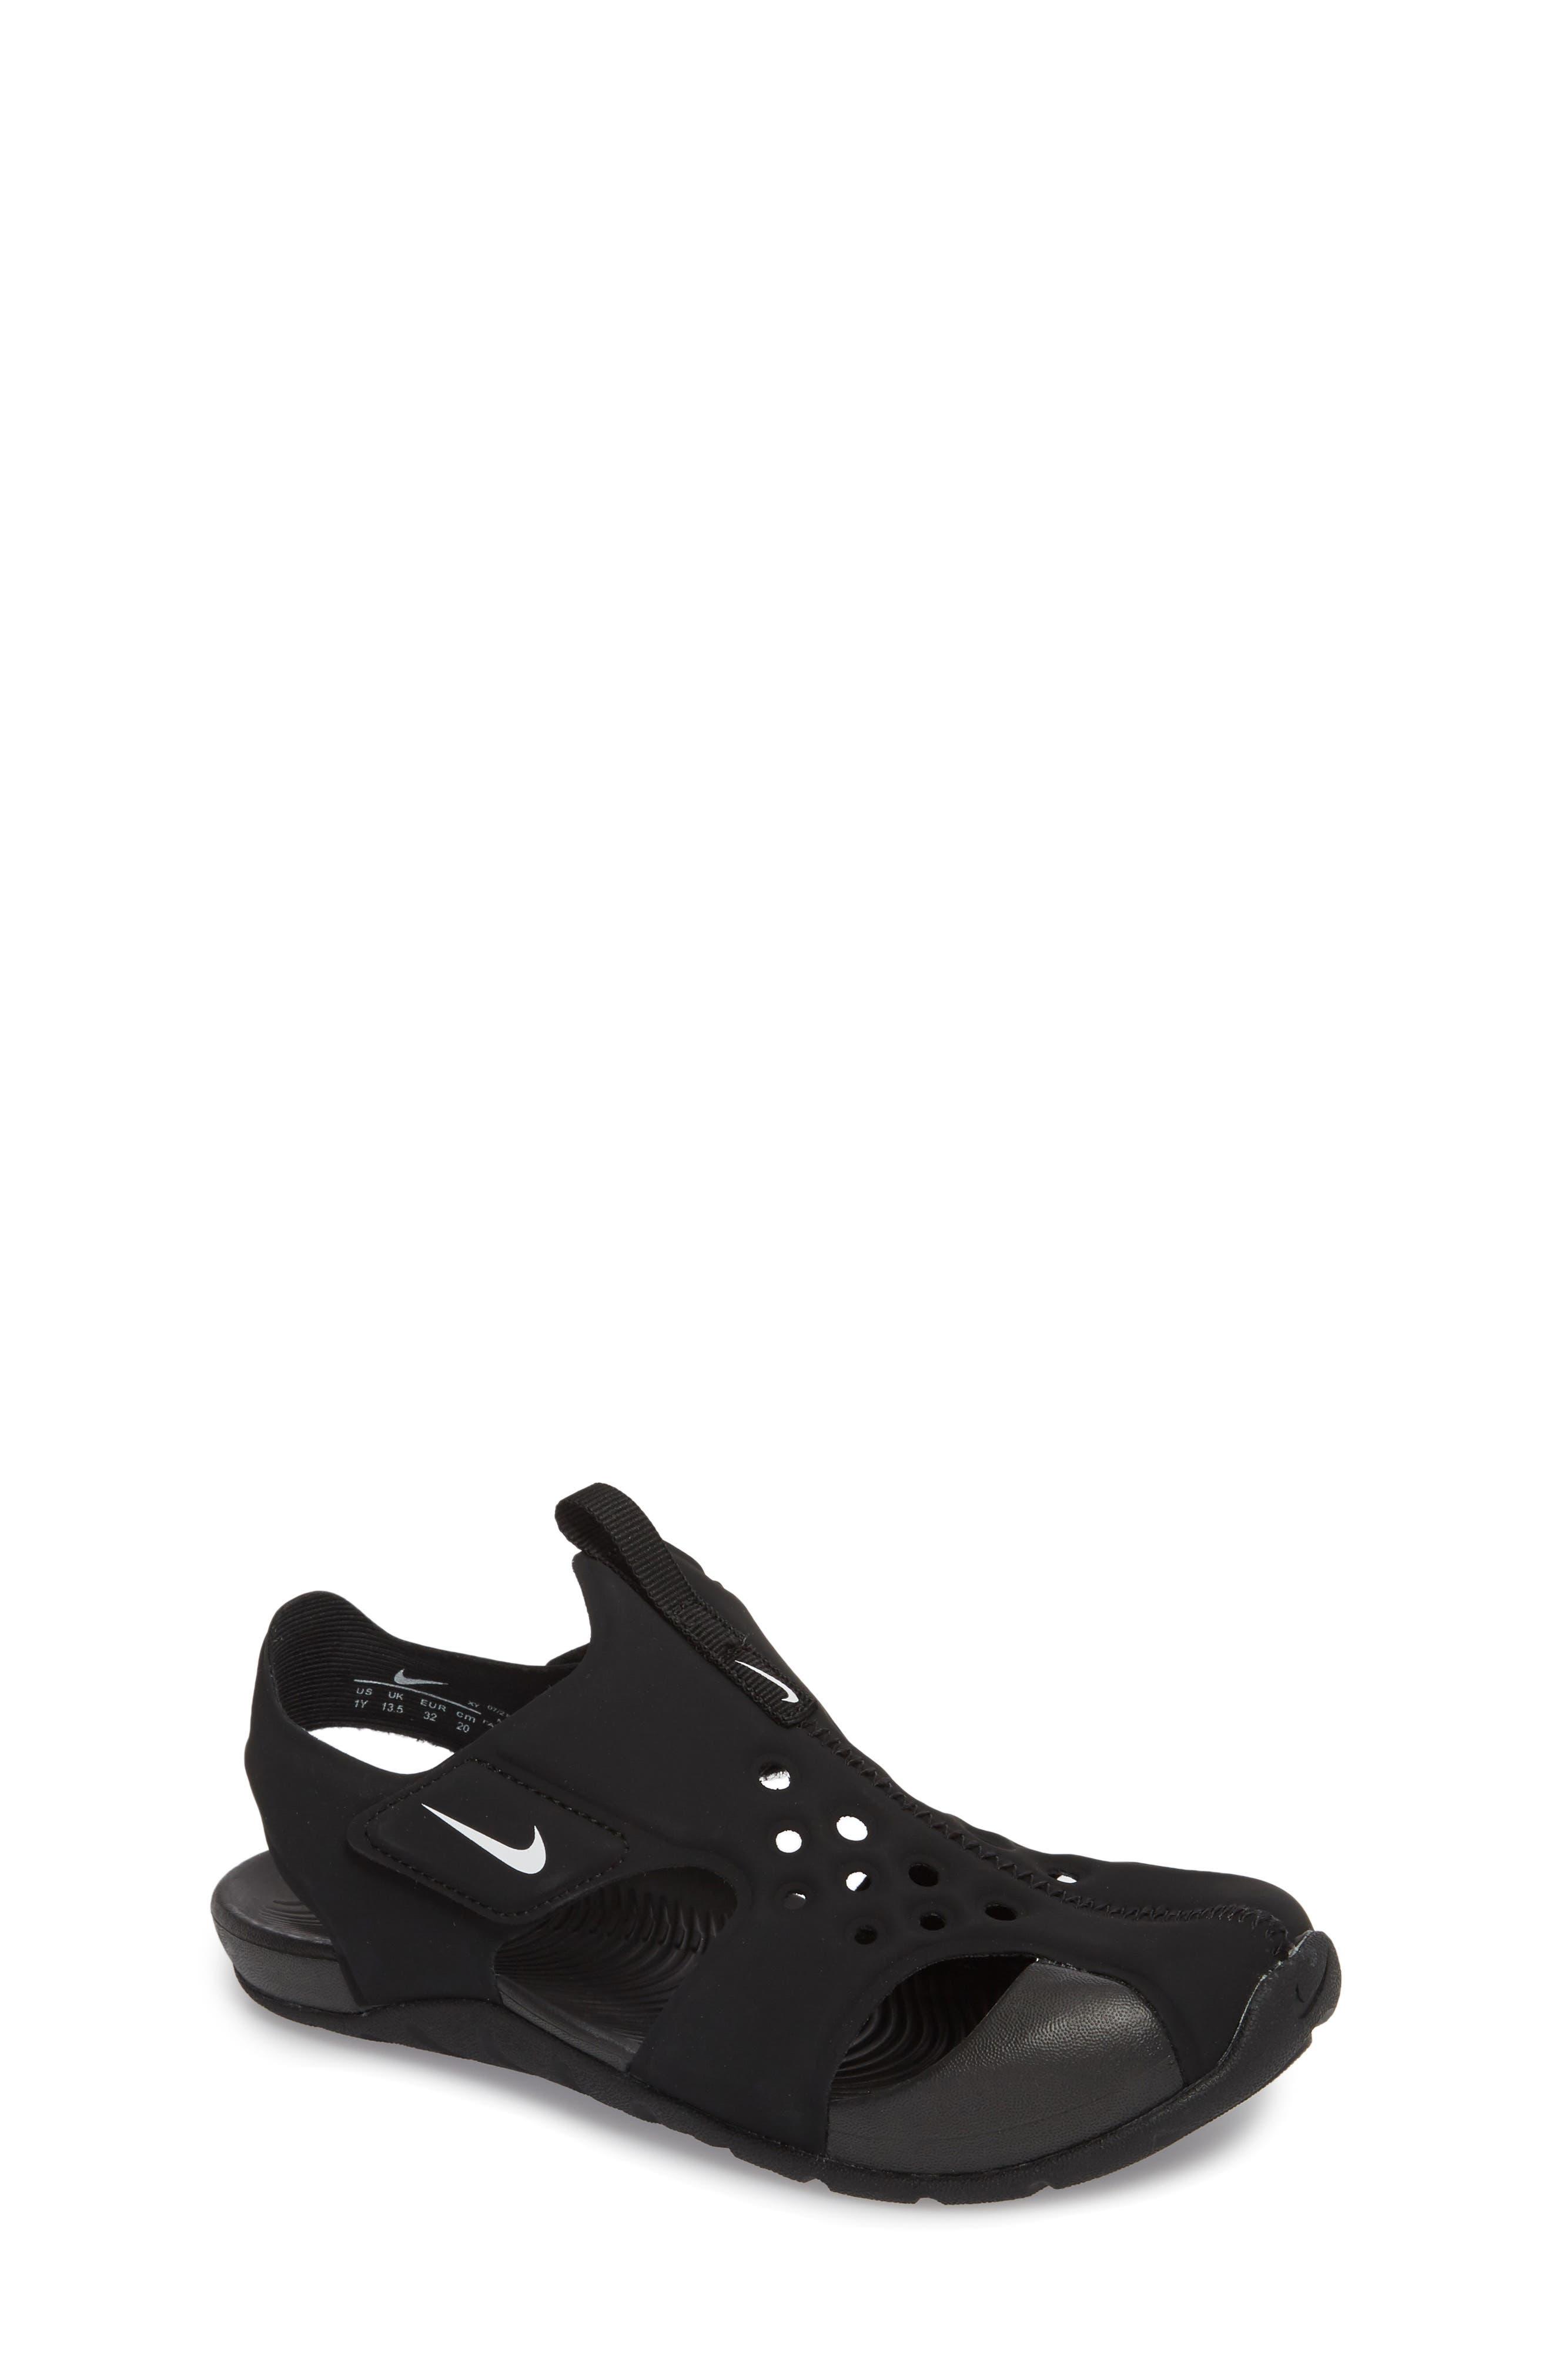 Main Image - Nike Sunray Protect 2 Sandal (Baby, Walker, Toddler & Little Kid)